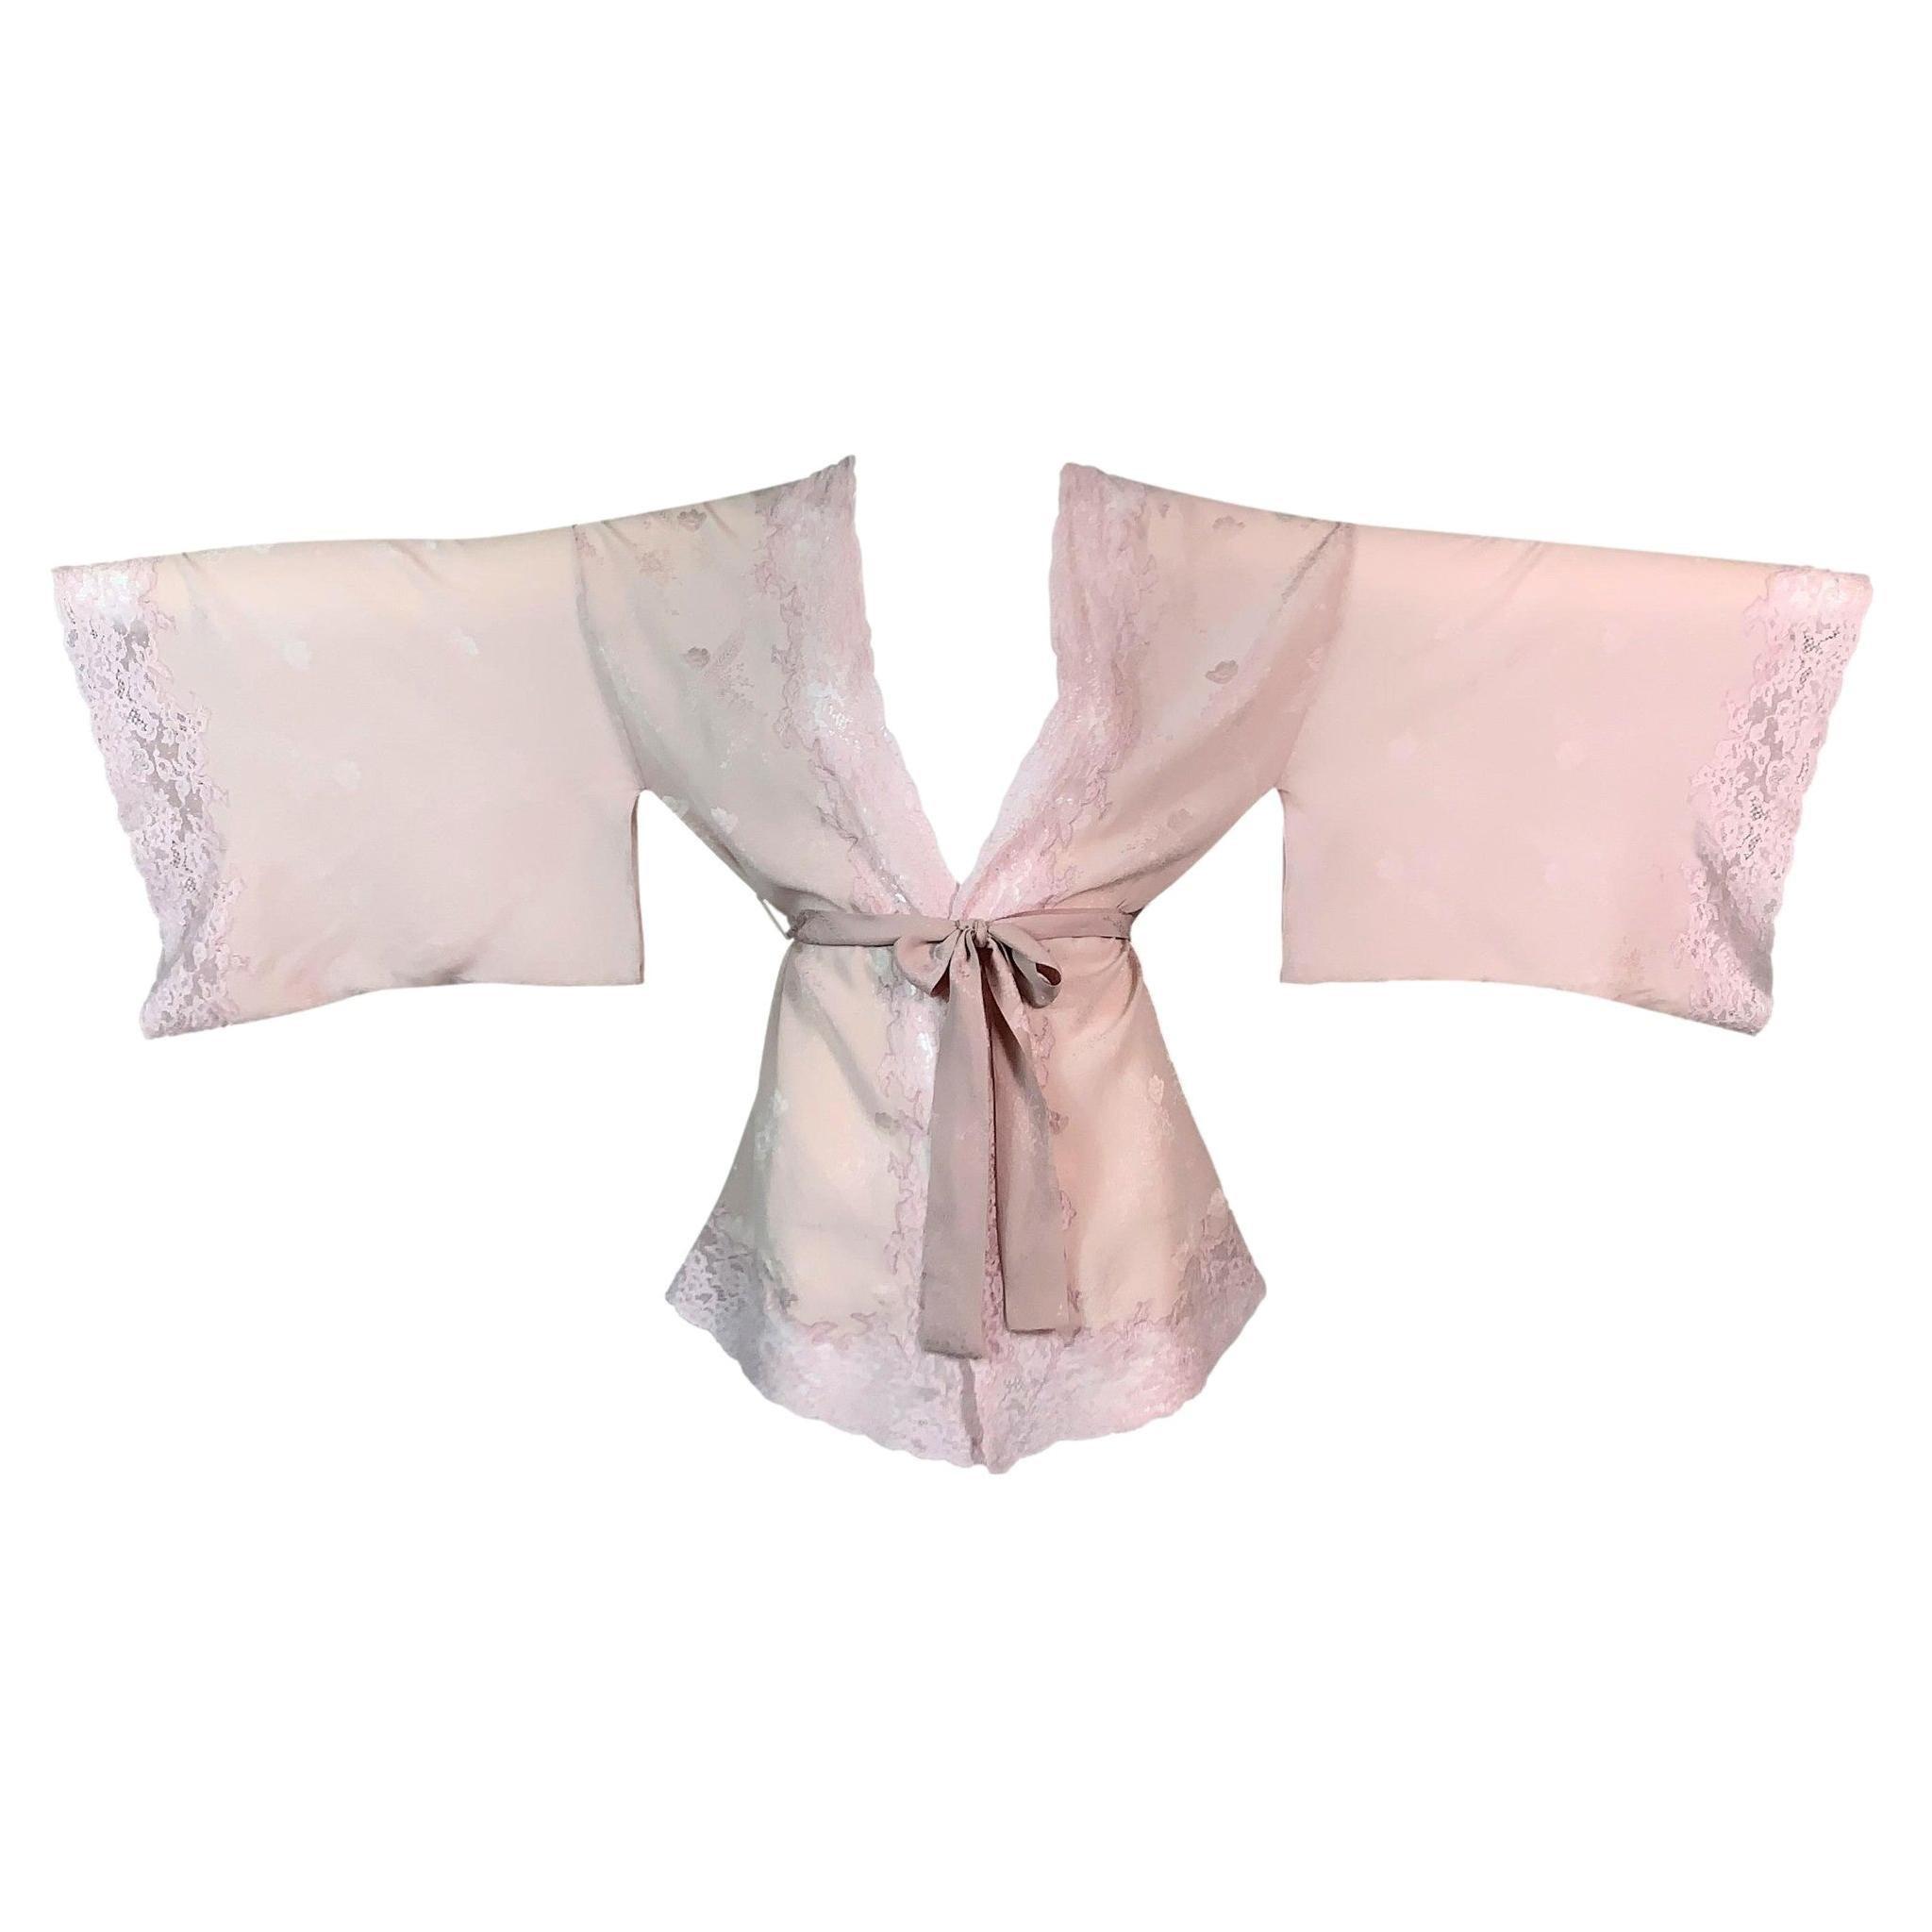 F/W 1999 Christian Dior John Galliano Pastel Pink Silk Lace Kimono Top